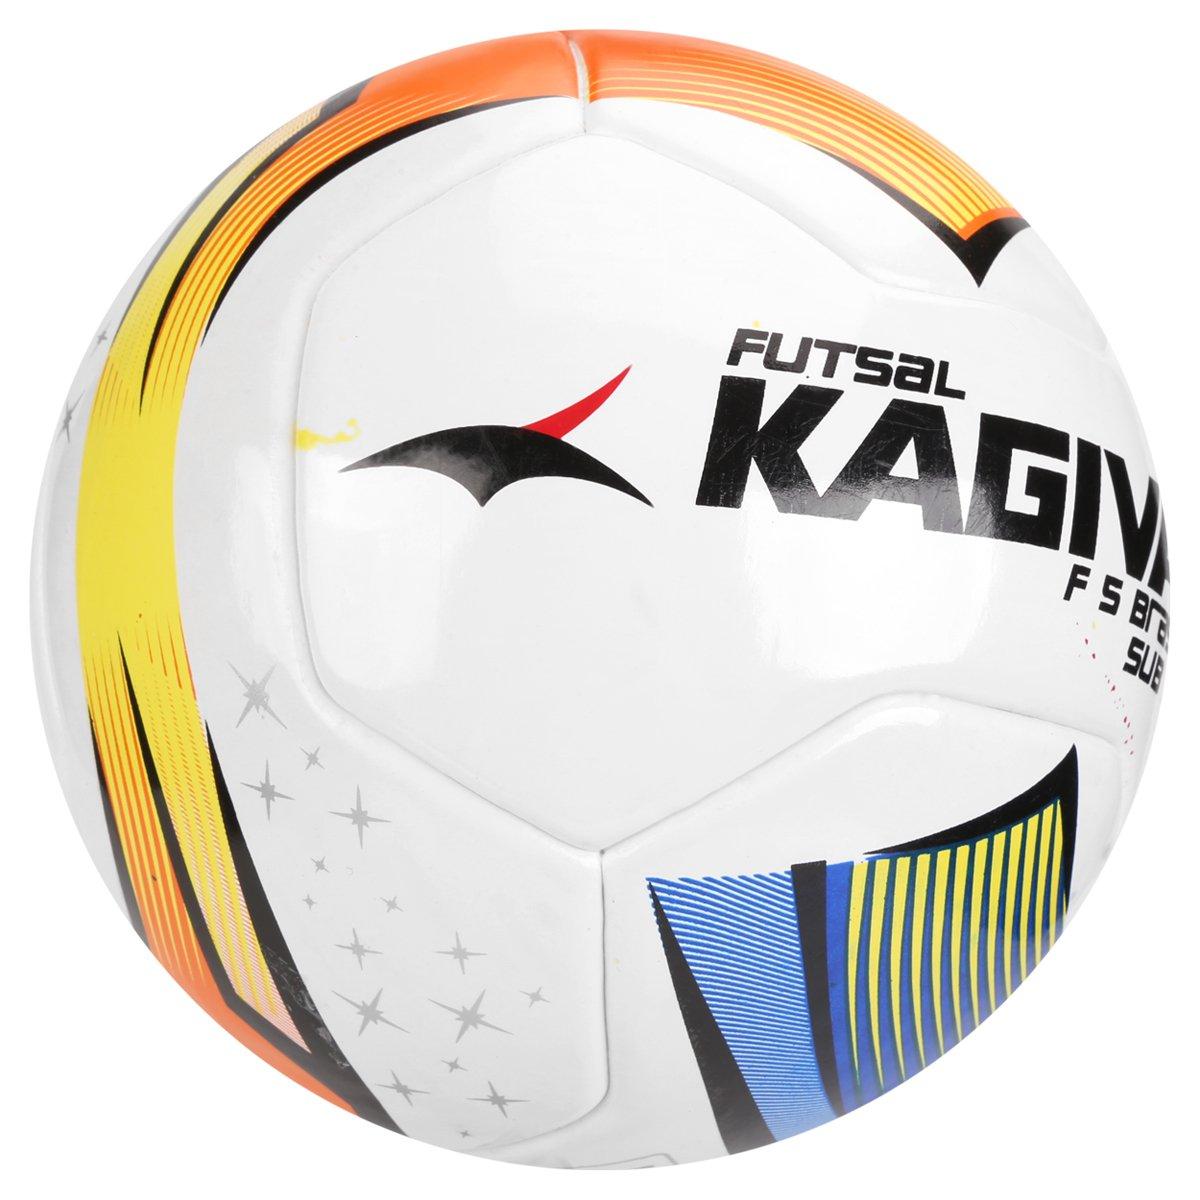 Bola Futebol Kagiva F5 Pro Sub 13 FPFS Futsal Infantil - Compre ... 3facb1aa27b82